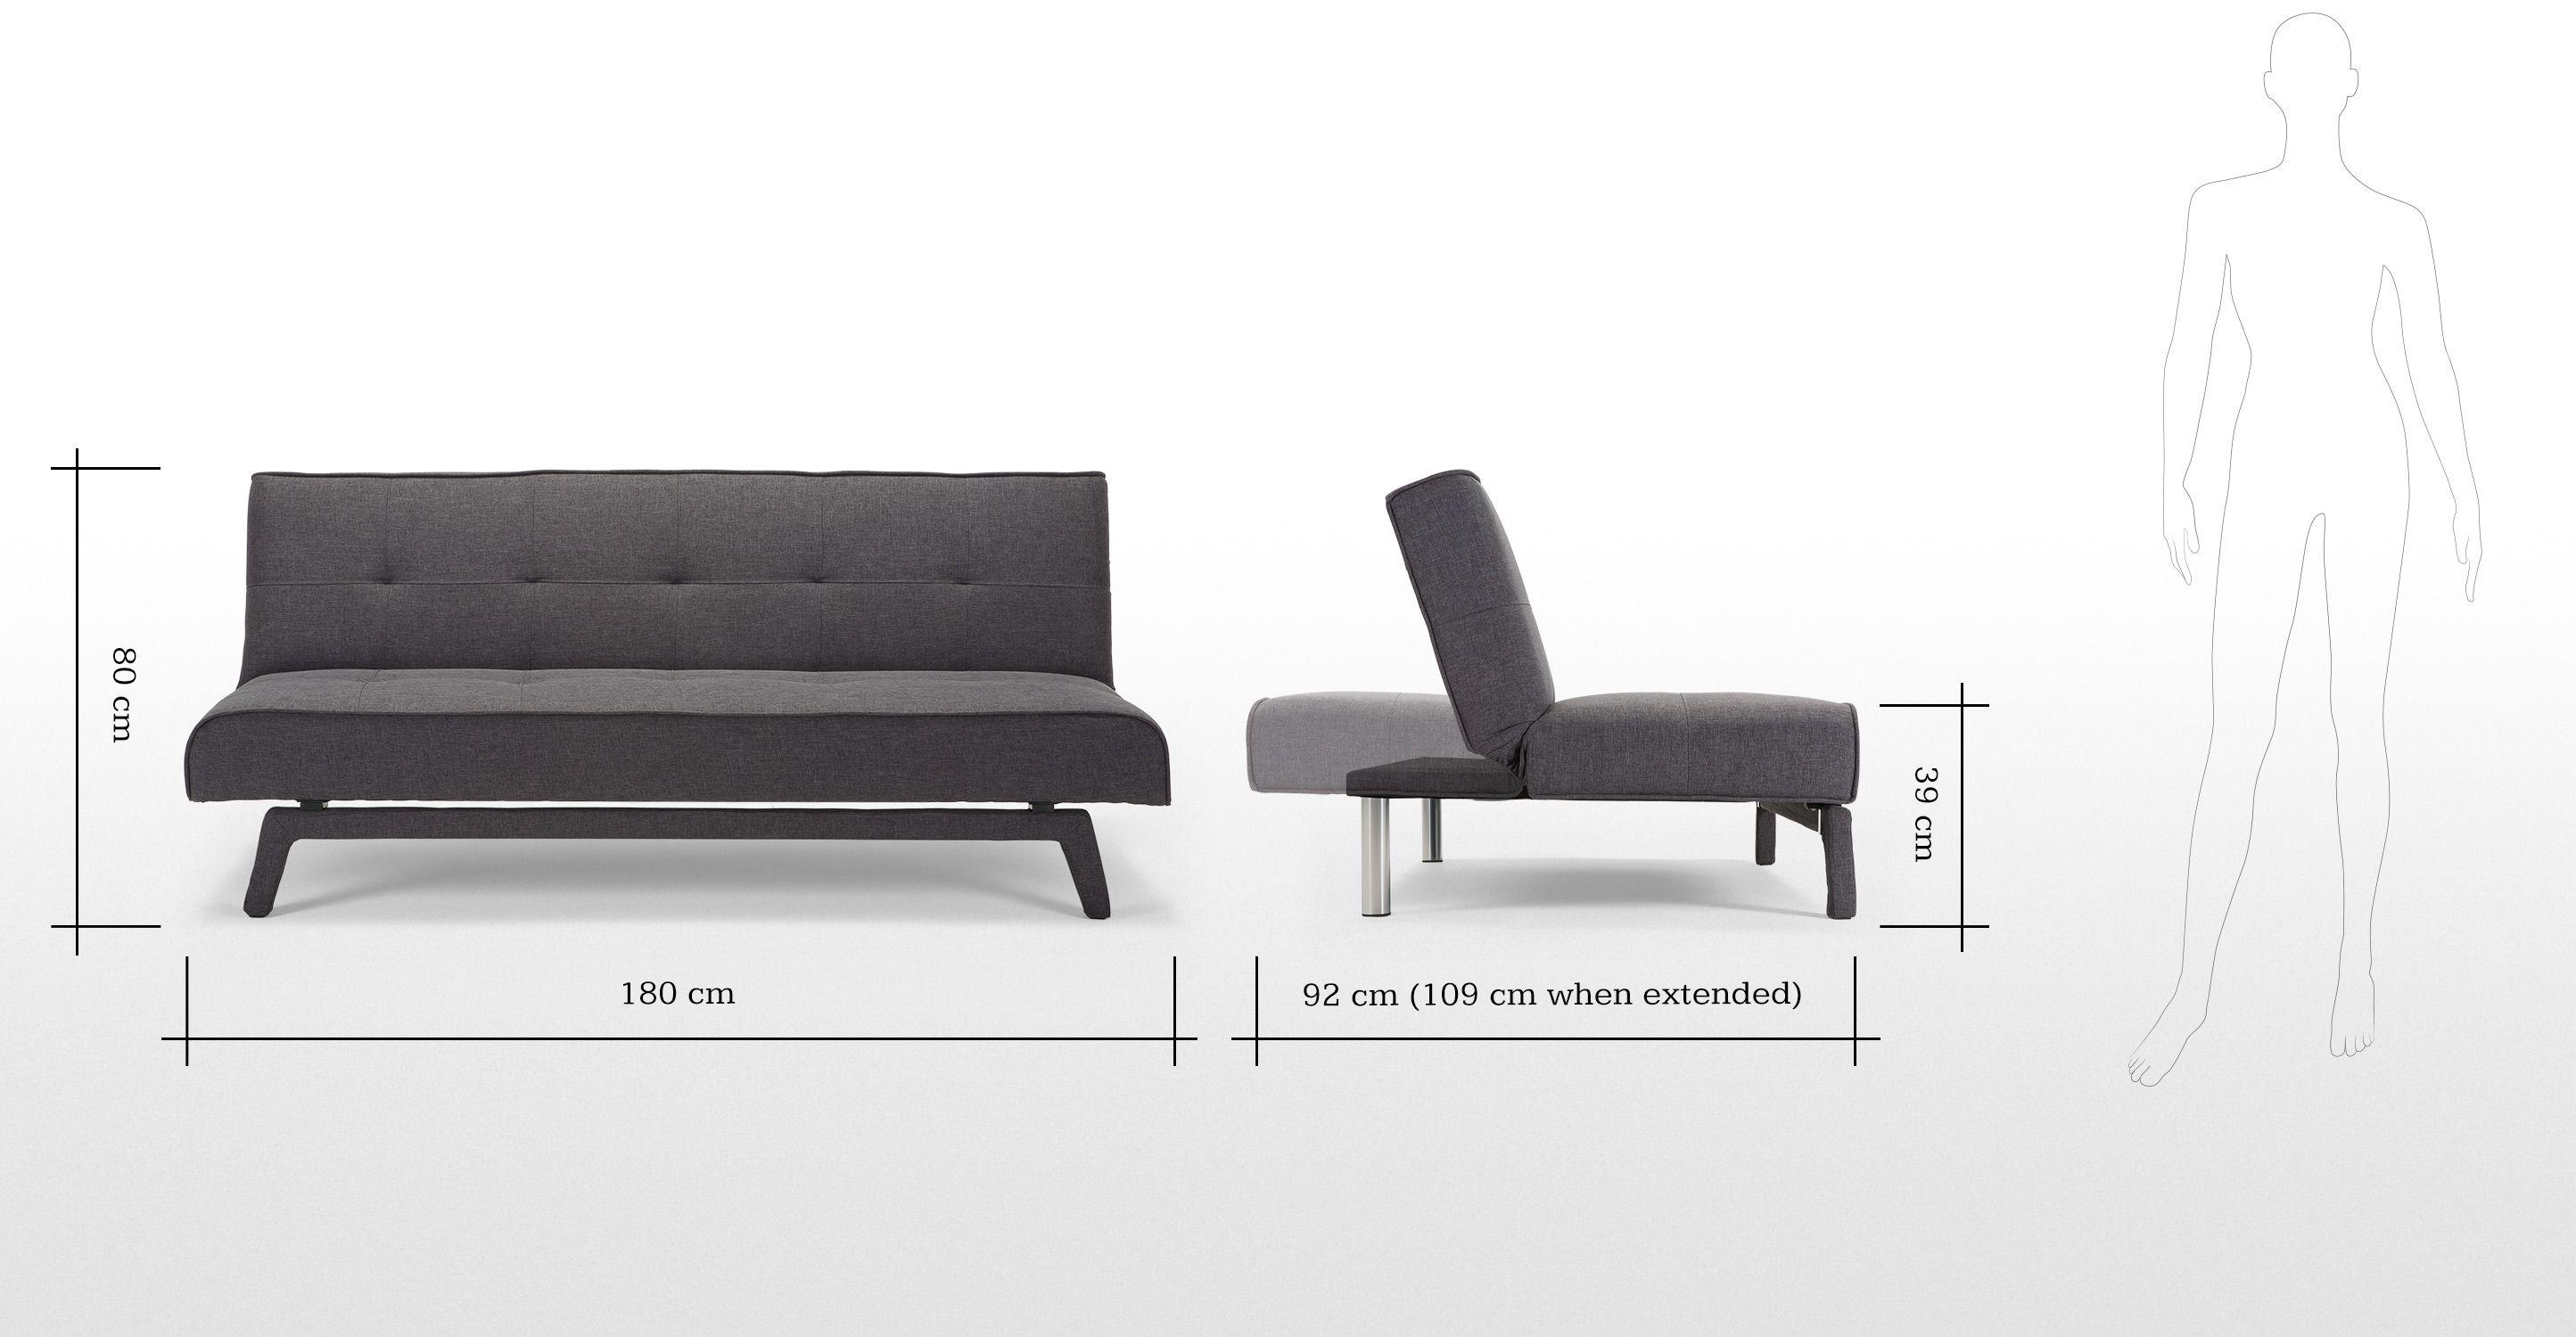 Yoko Click Clack Sofa Bed Cygnet Grey Mebel